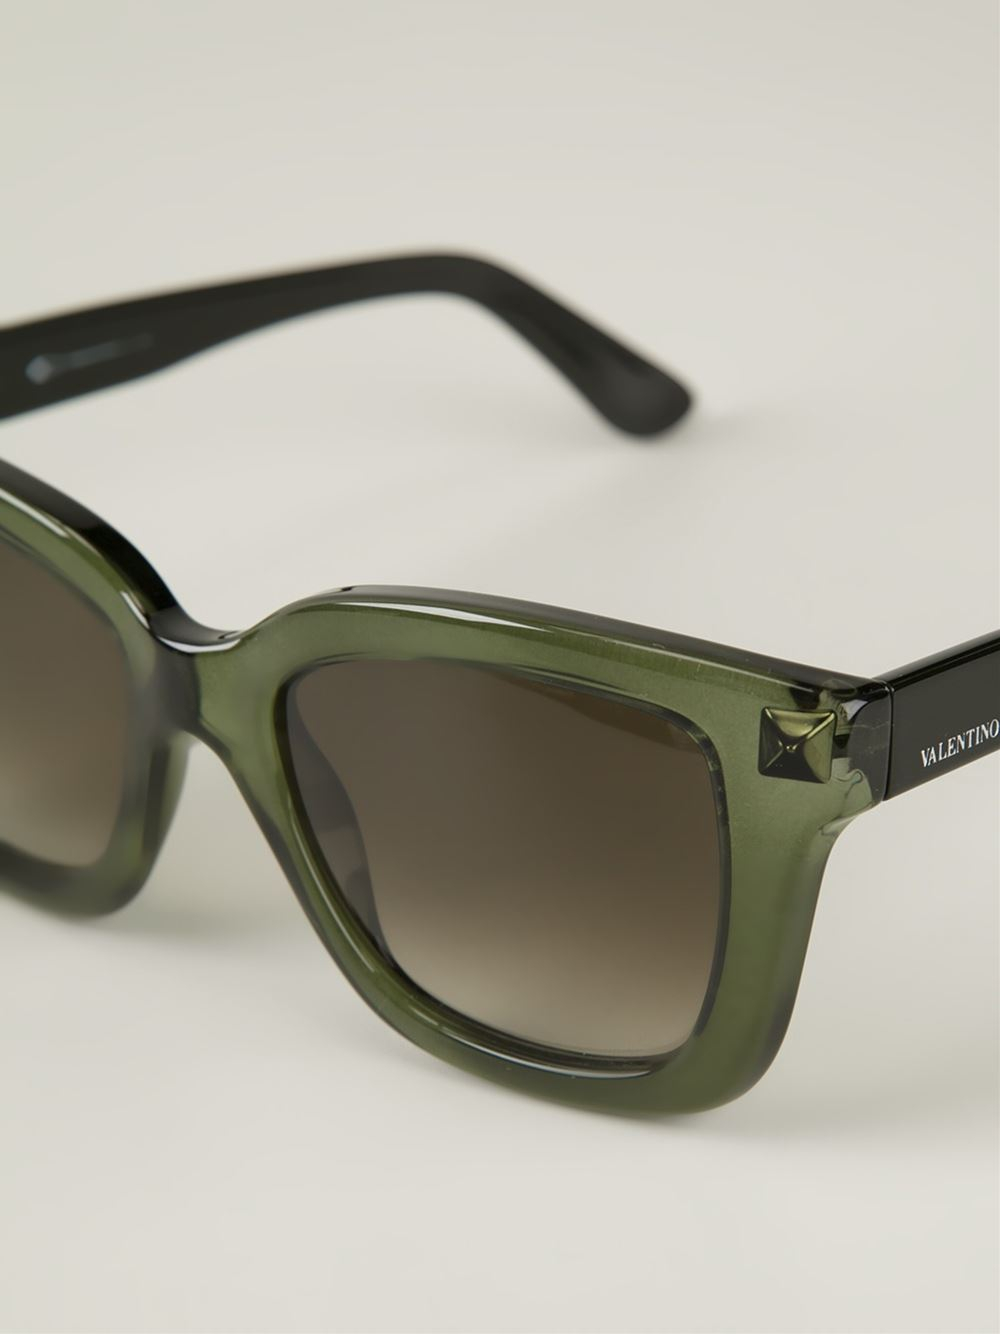 106d18b7f9a Valentino Sunglasses Men